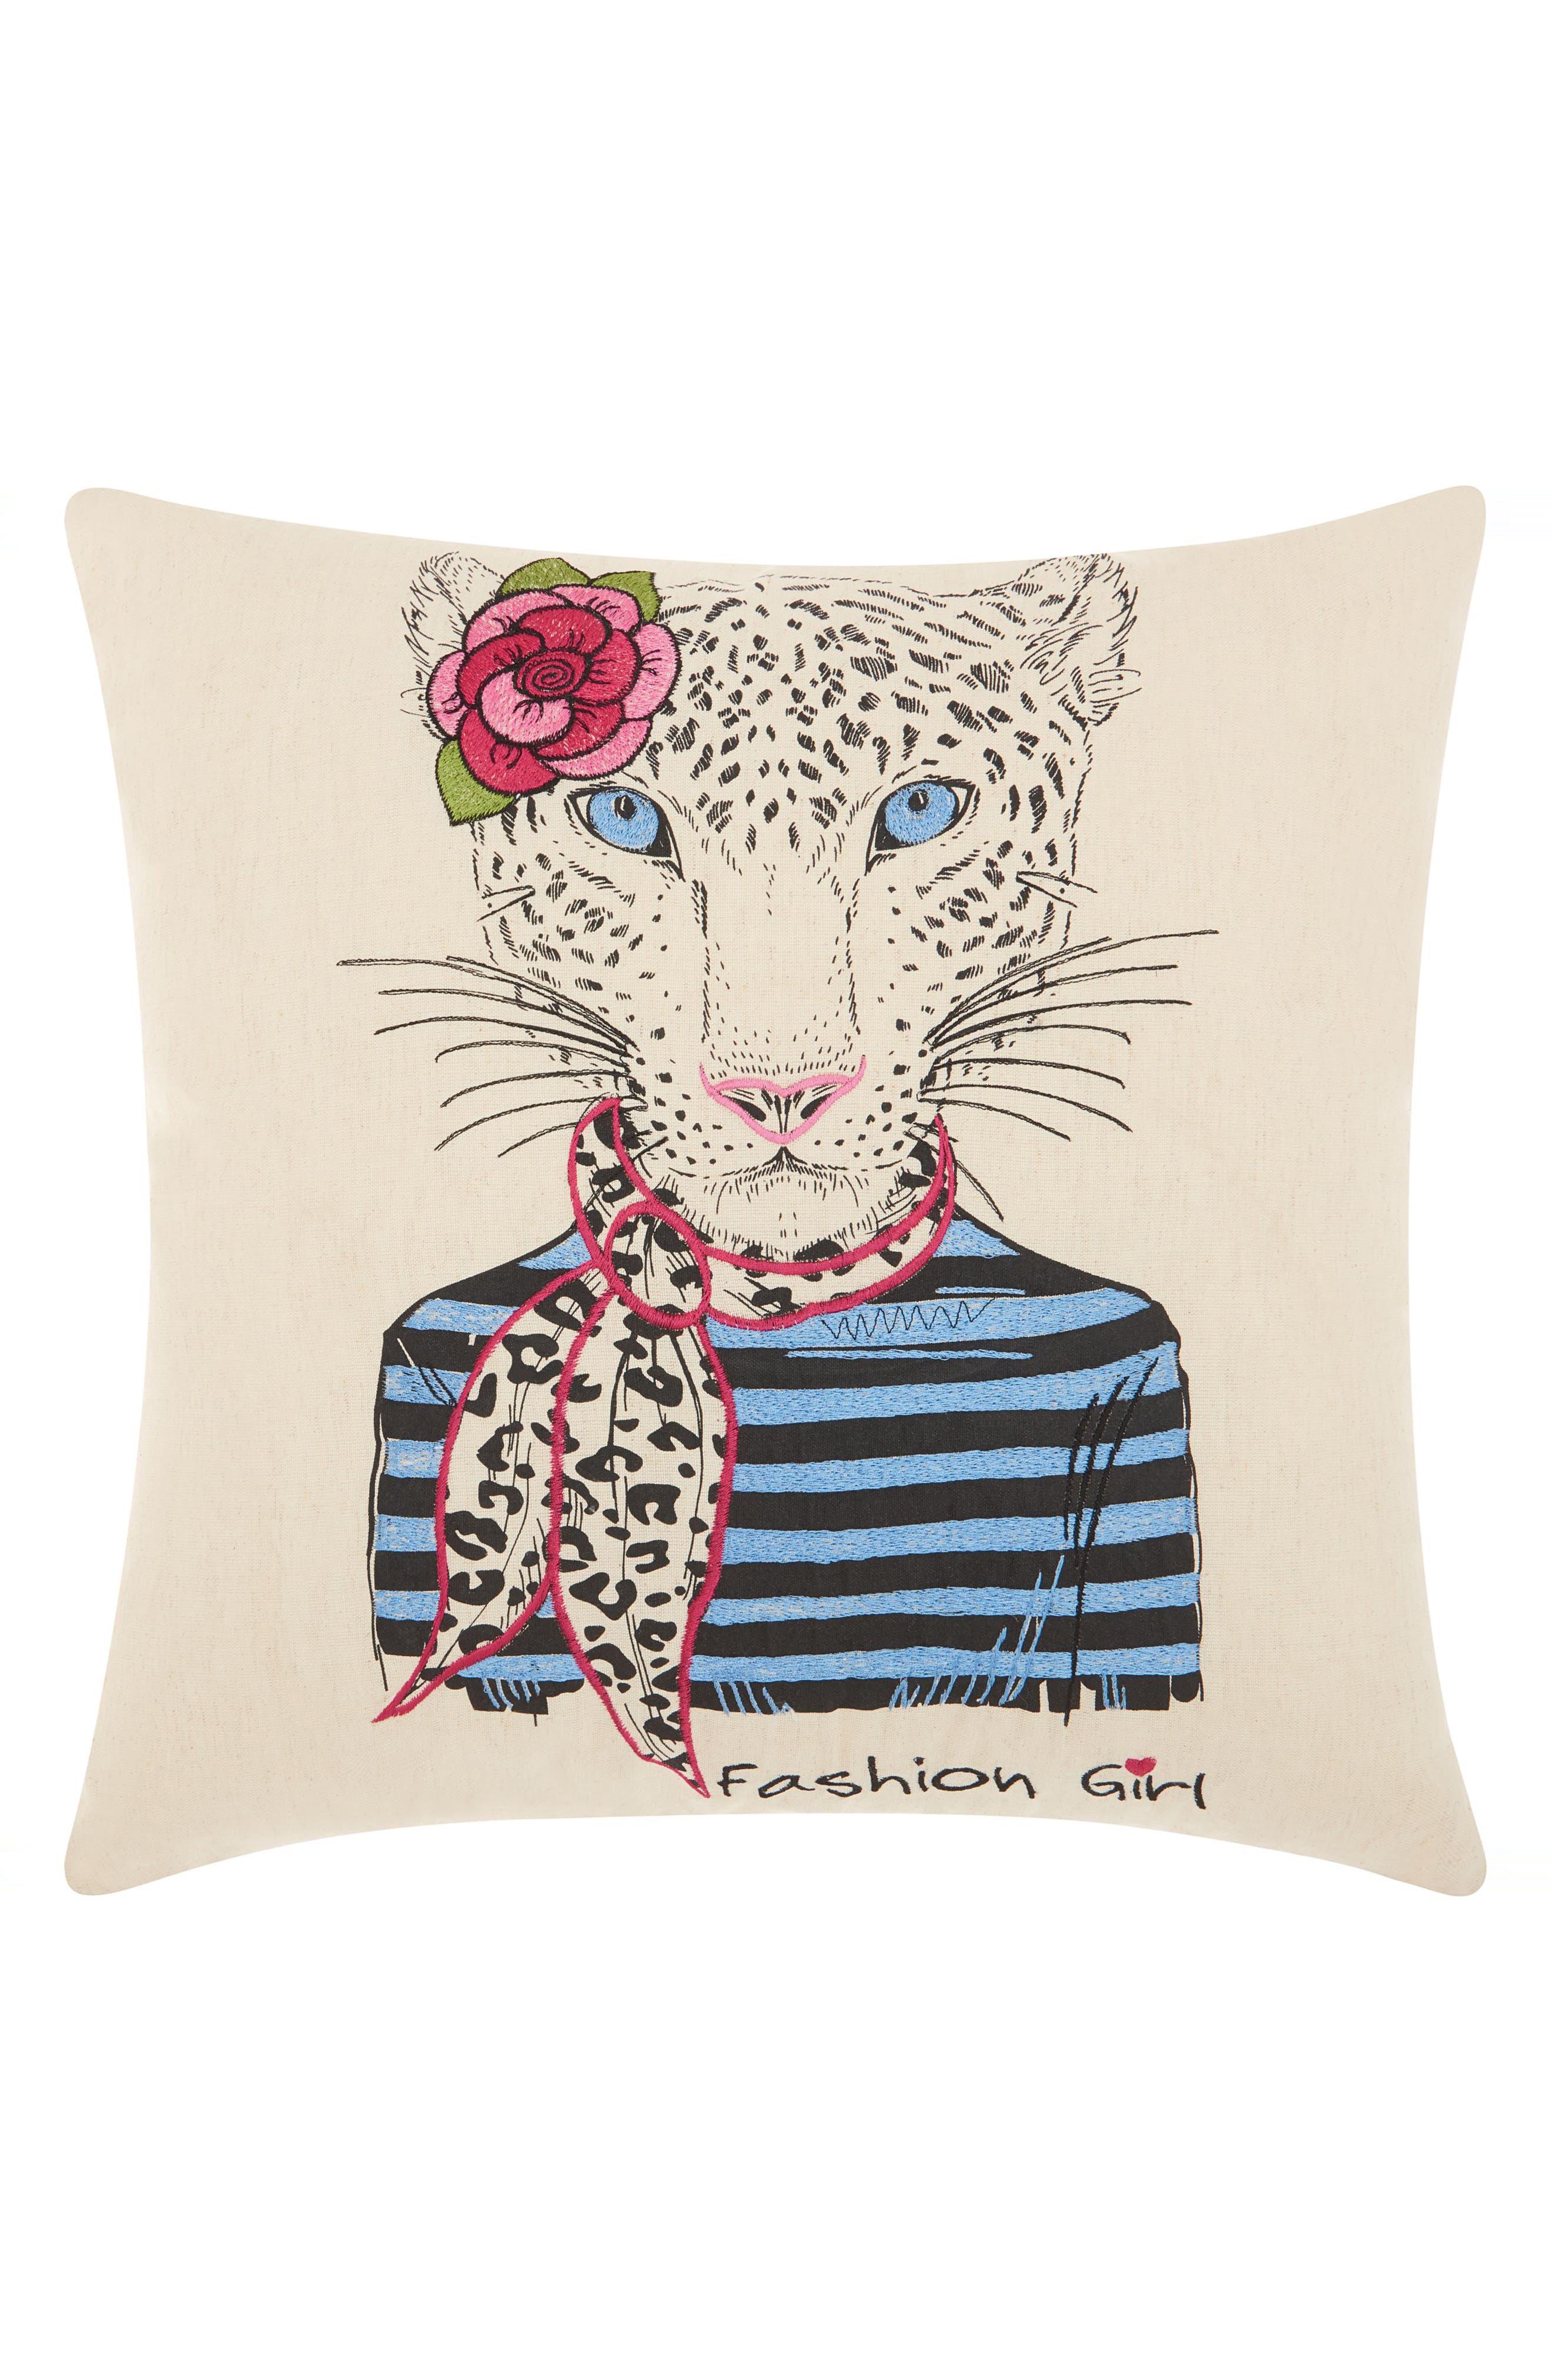 Snow Leopard Scarf Accent Pillow,                         Main,                         color,